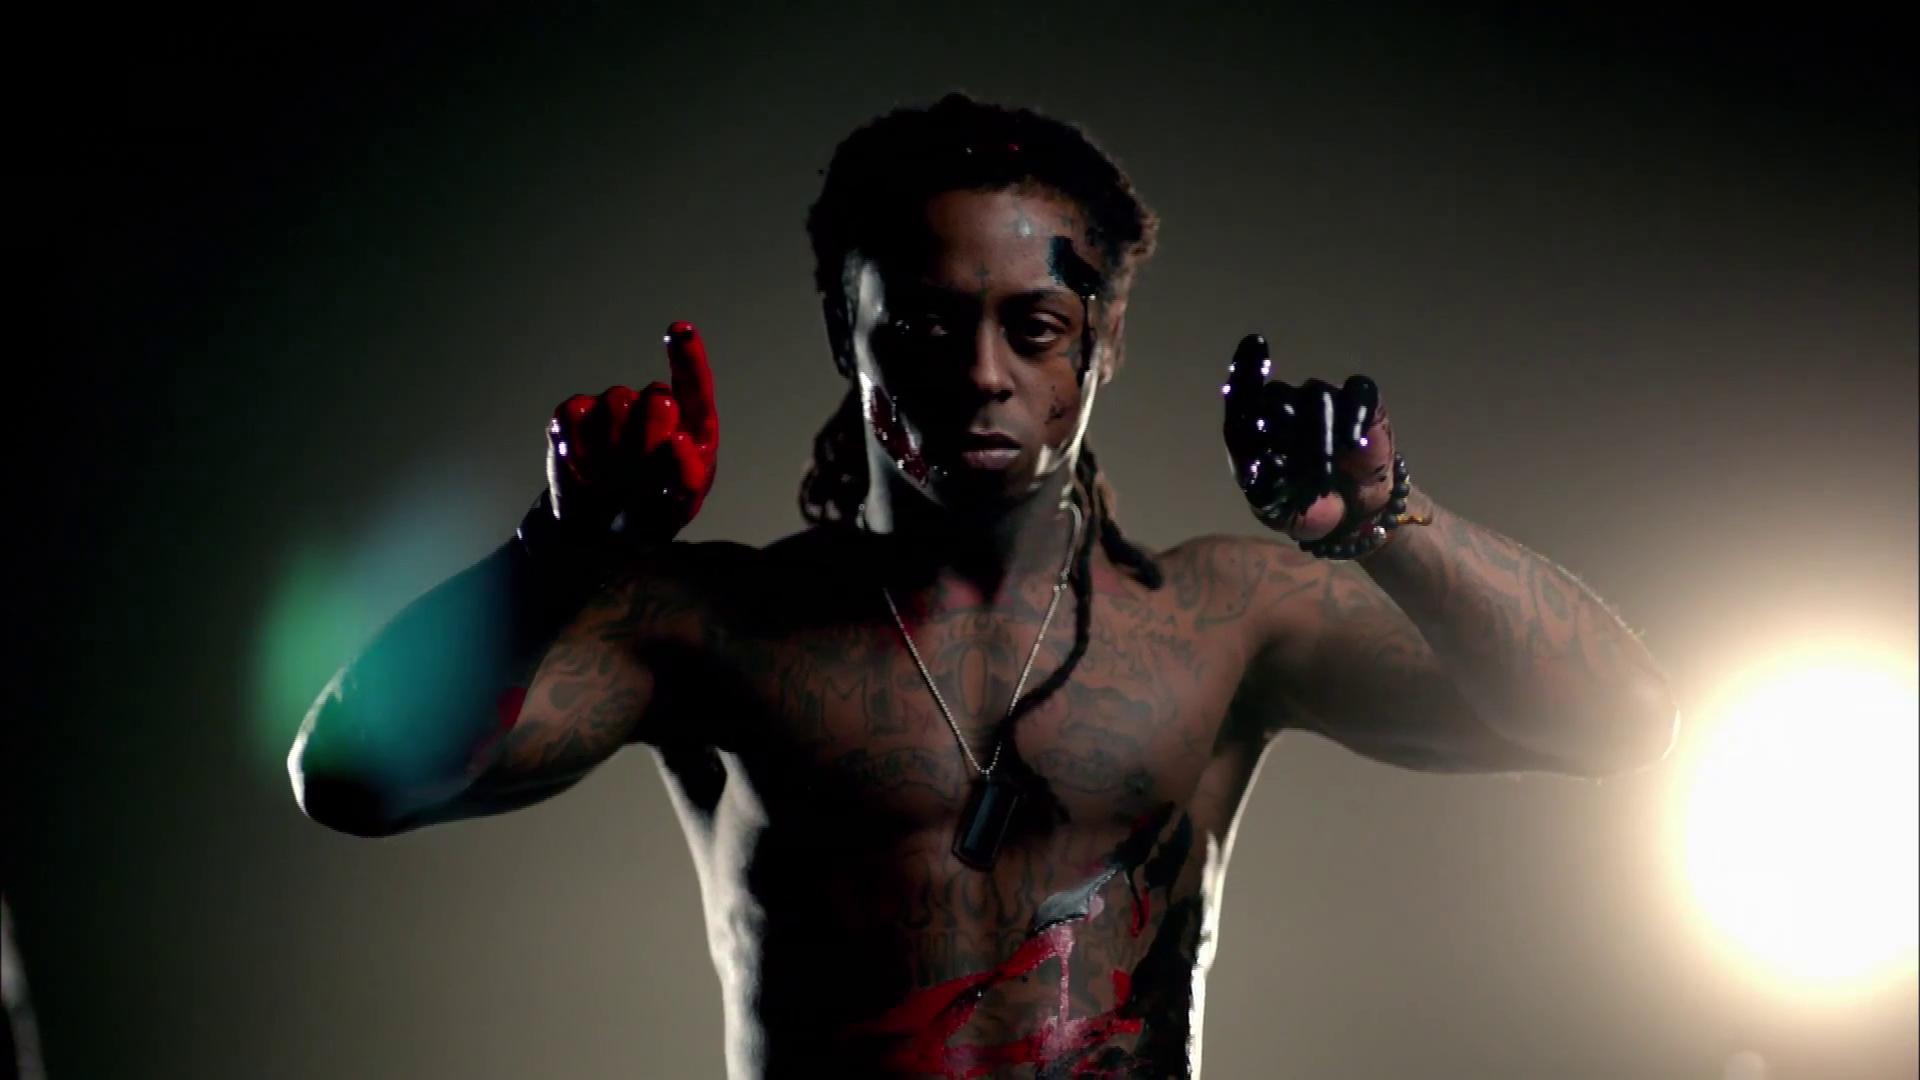 Lil Wayne 2015 Wallpapers 1920x1080